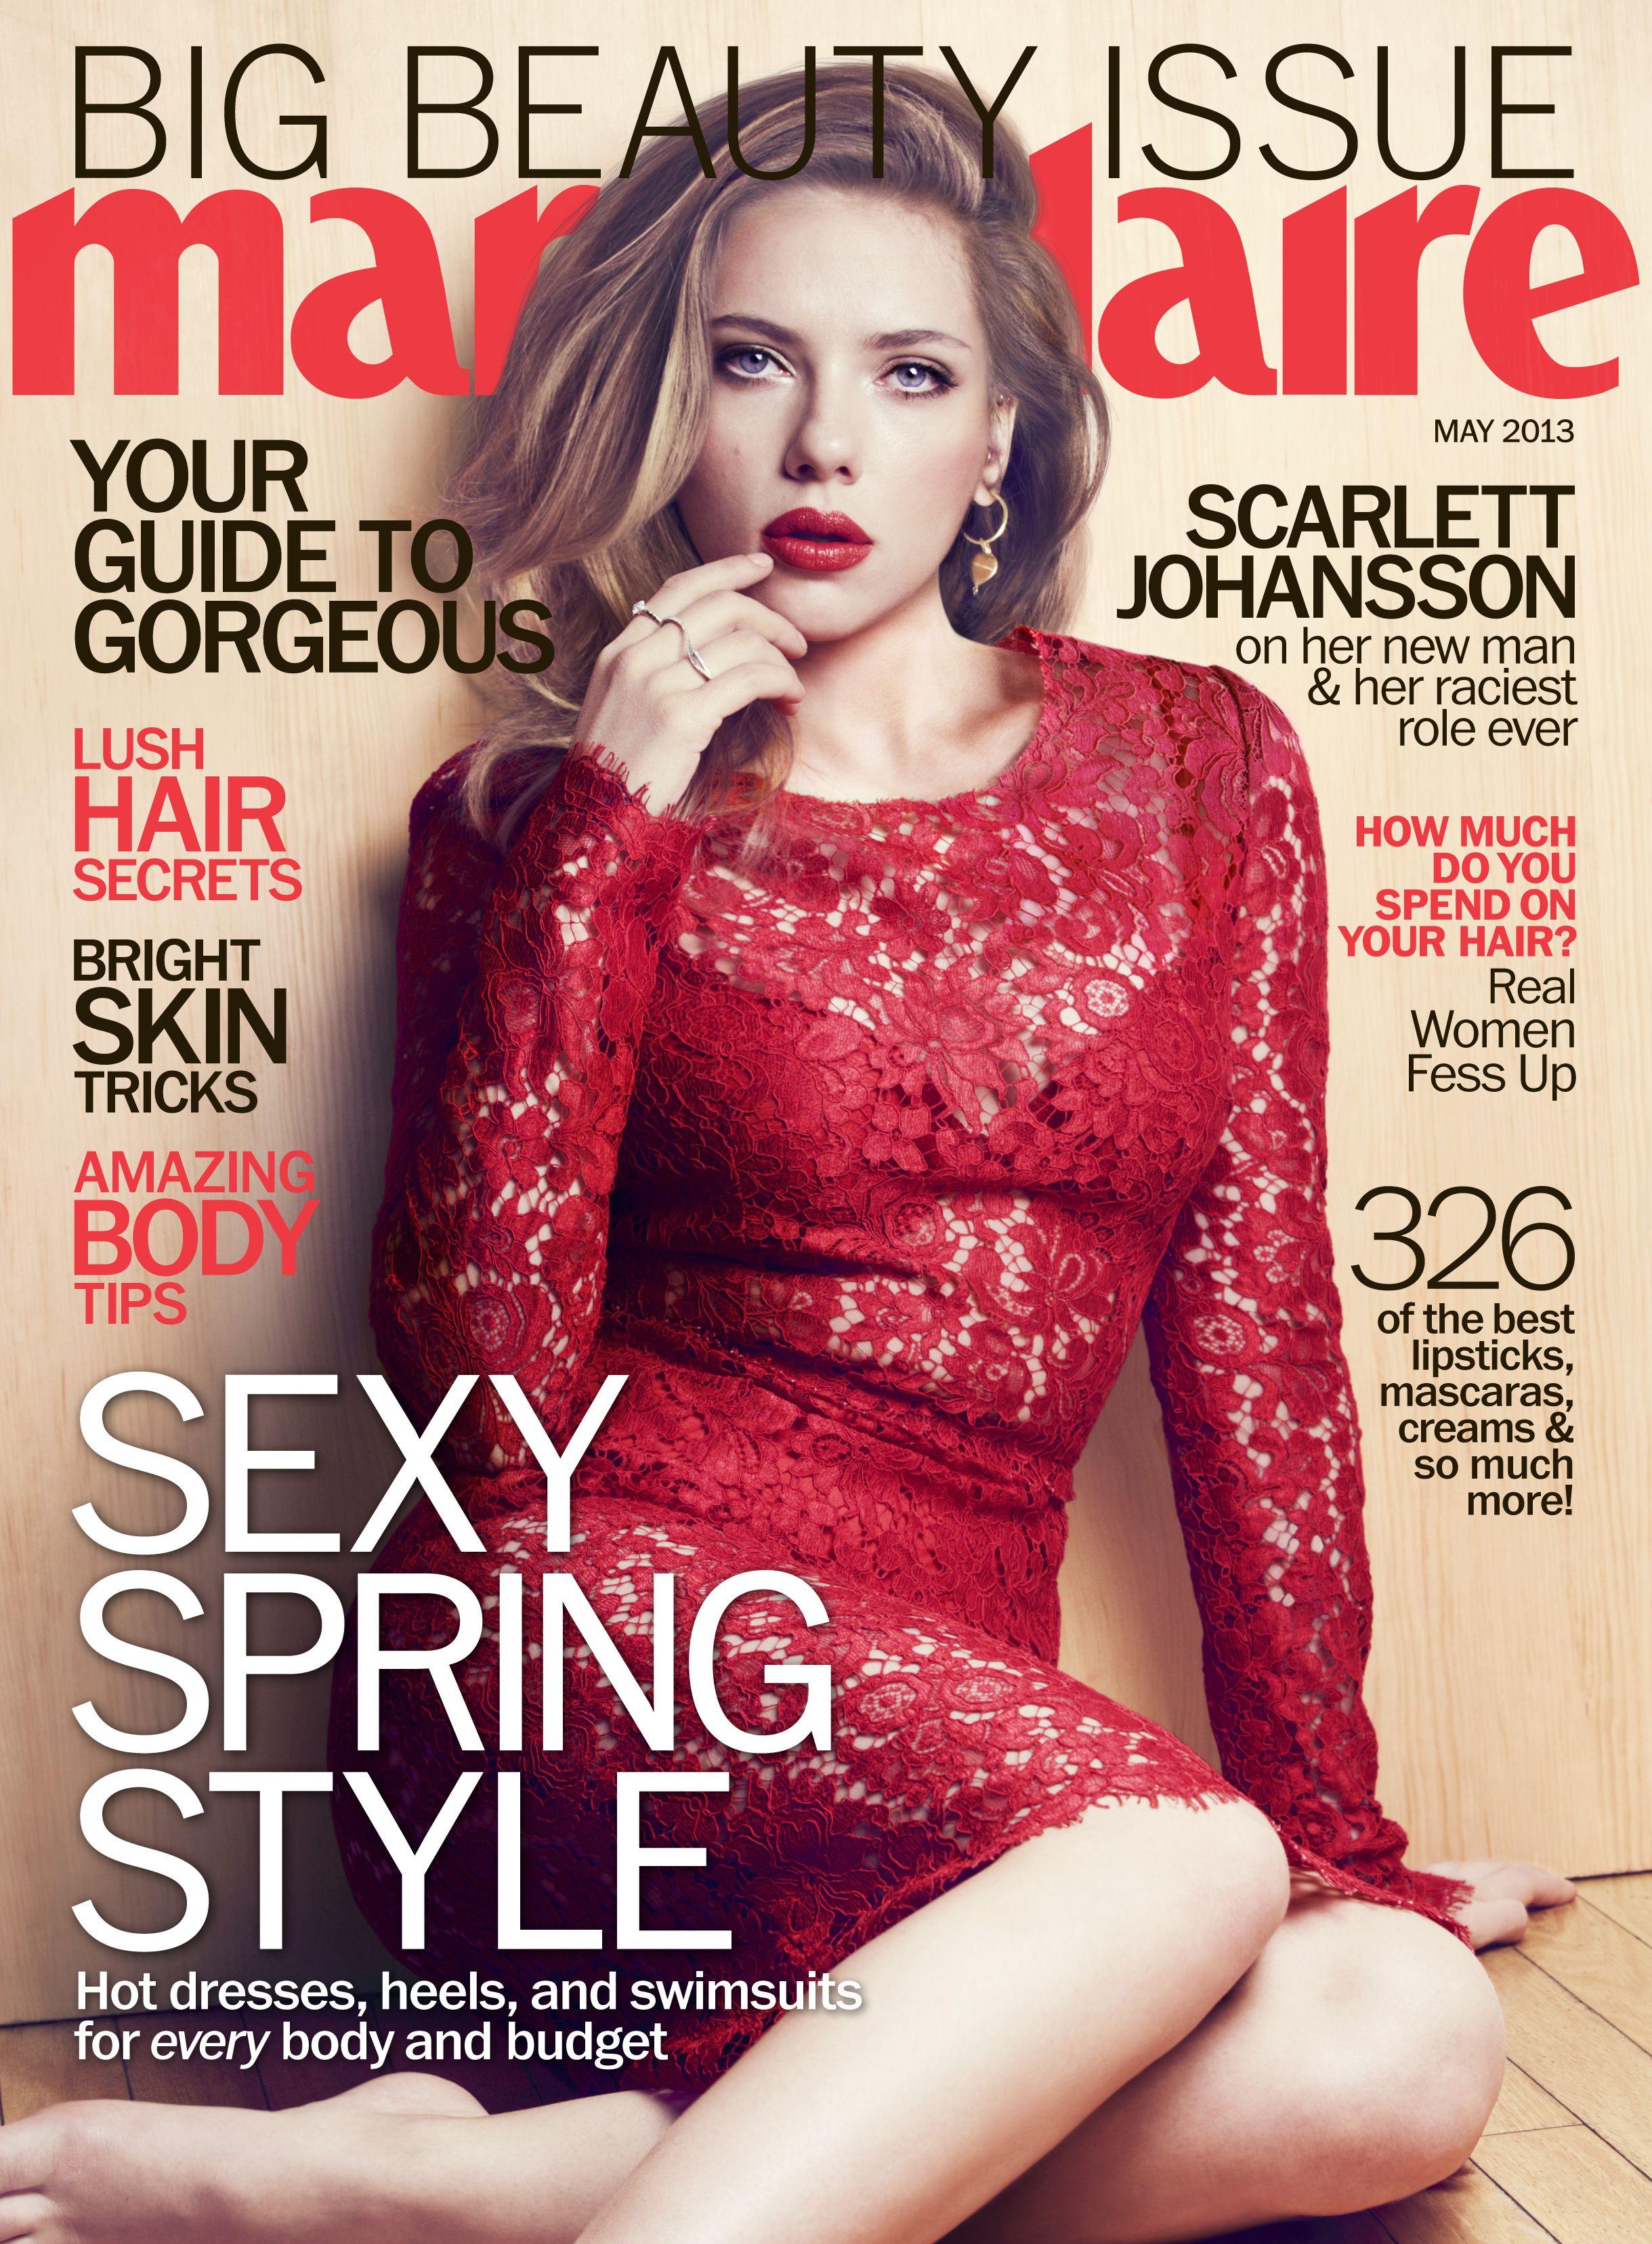 003de8e7ac Marie Claire Scarlett Johansson